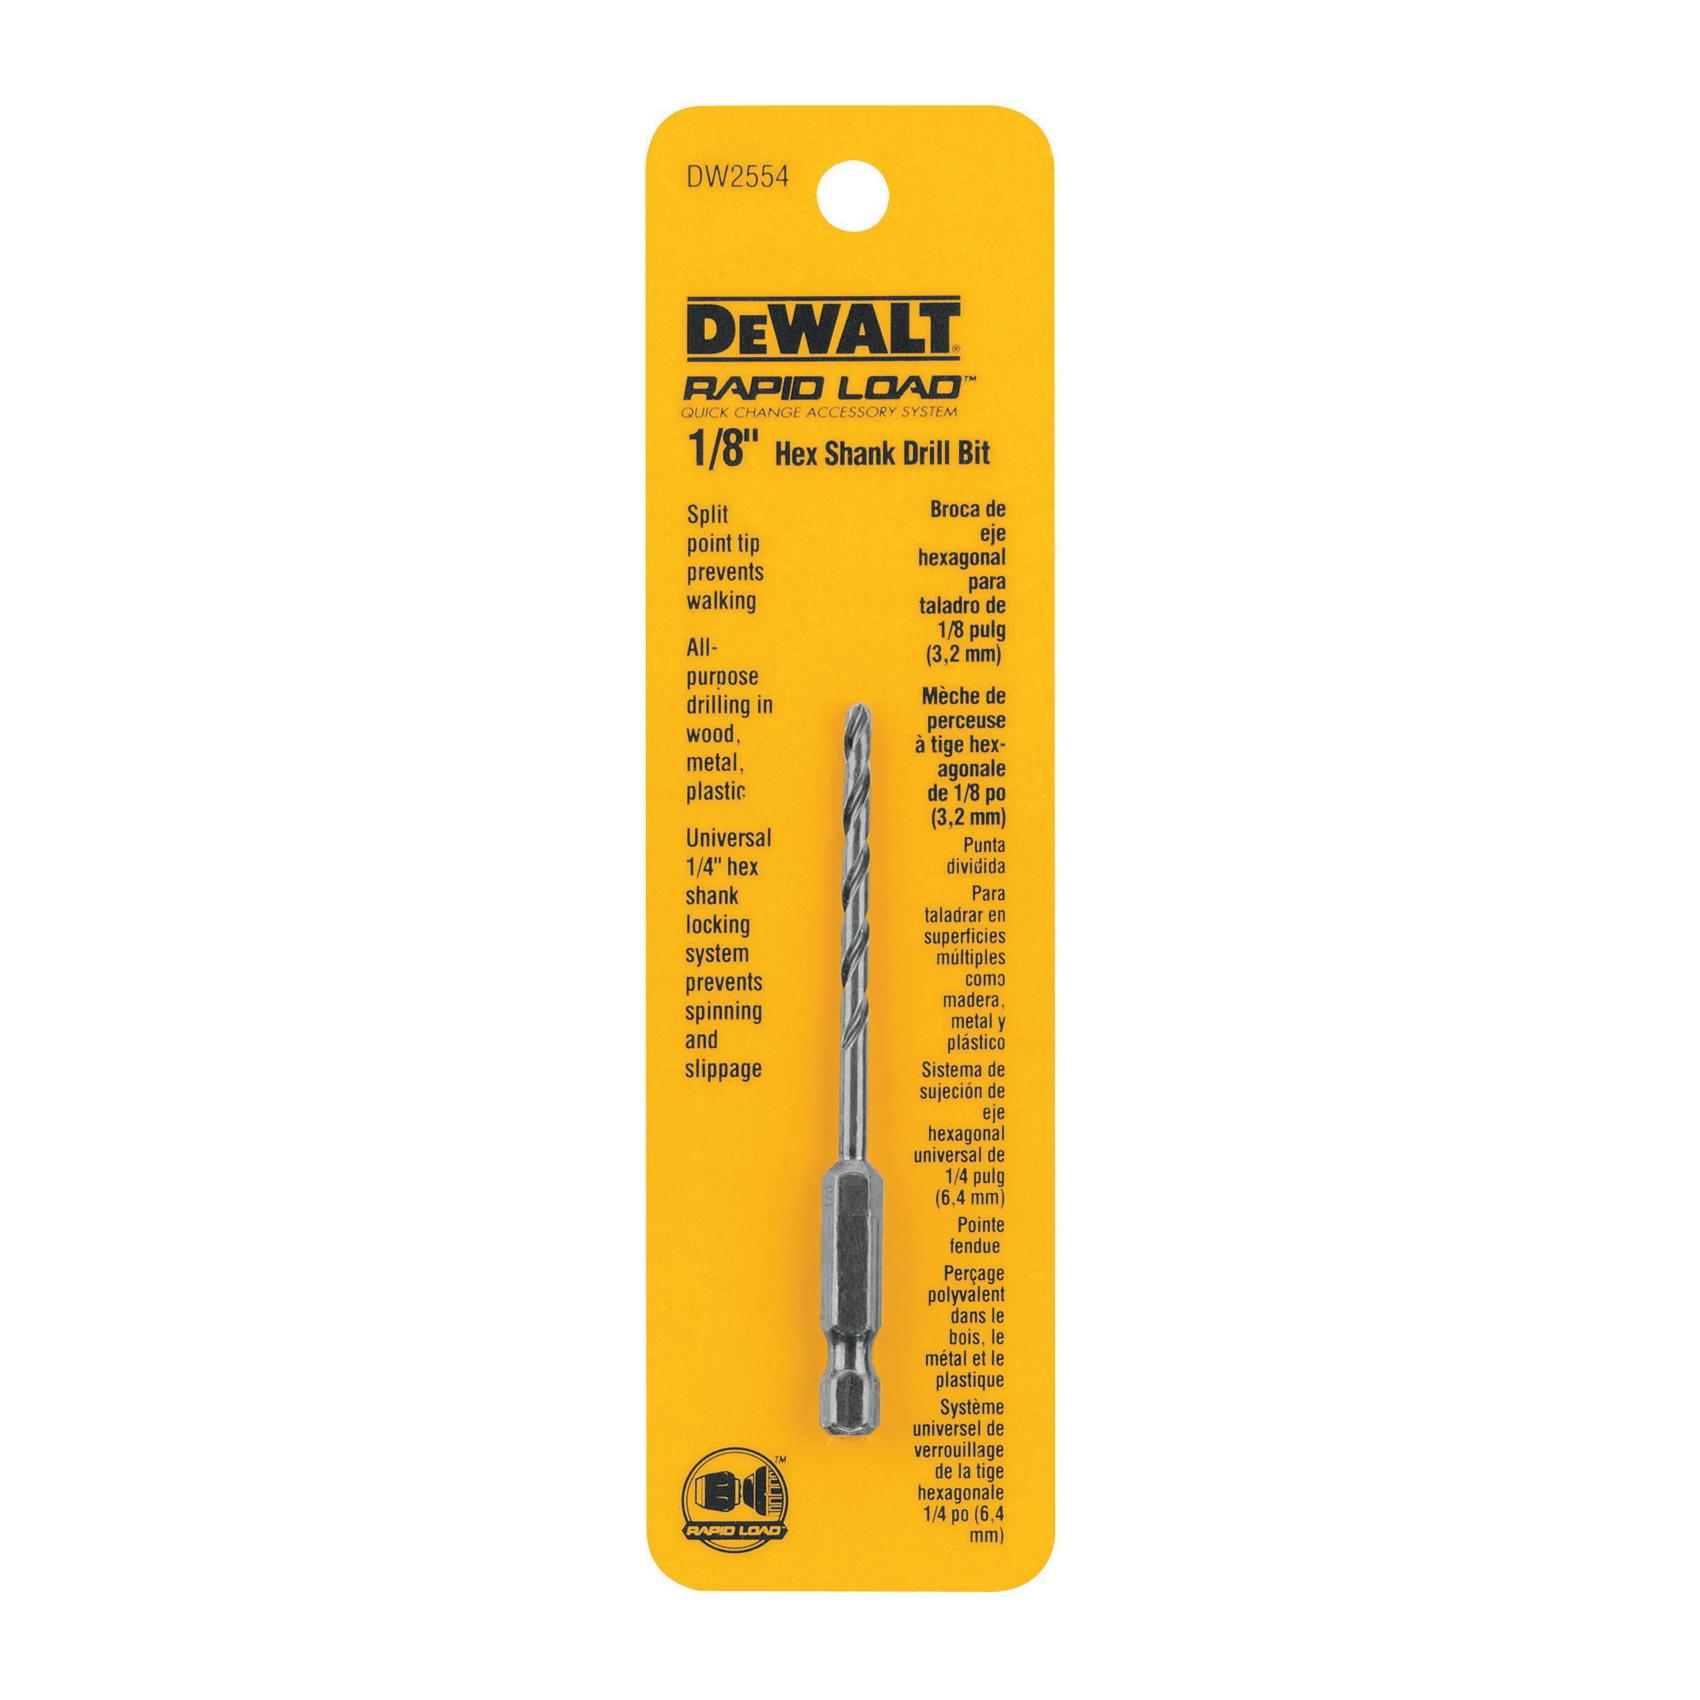 DeWALT® DW2554 Multi-Purpose Multi-Purpose Hex Shank Drill Bit, 1/8 in Drill - Fraction, 0.125 in Drill - Decimal Inch, 1.12 in D Cutting